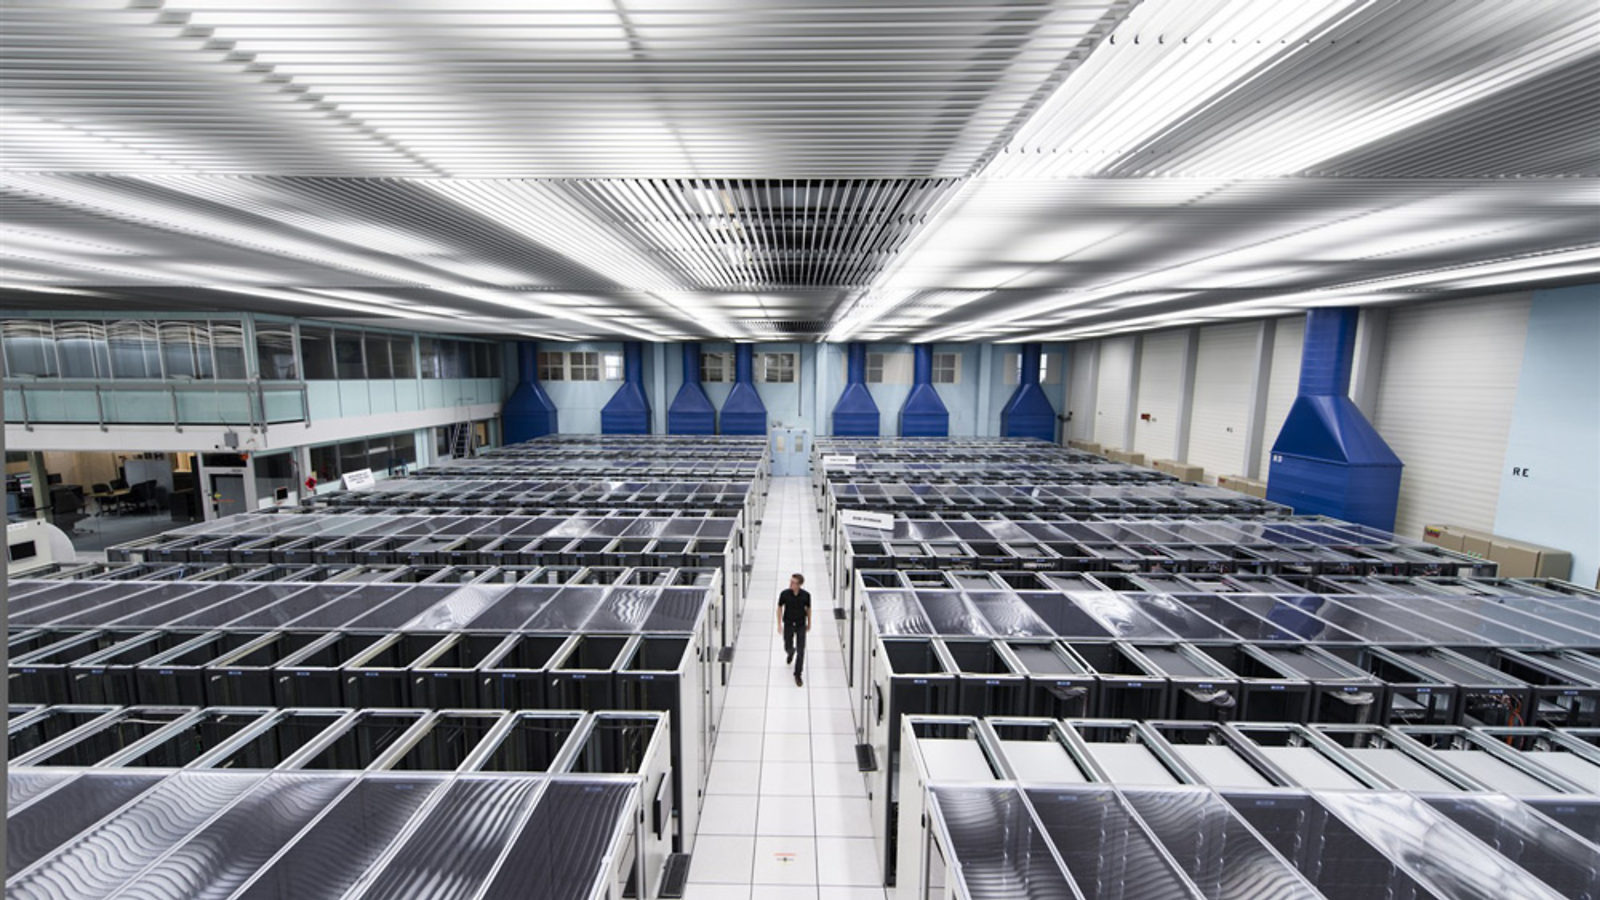 Image: CERN computer center